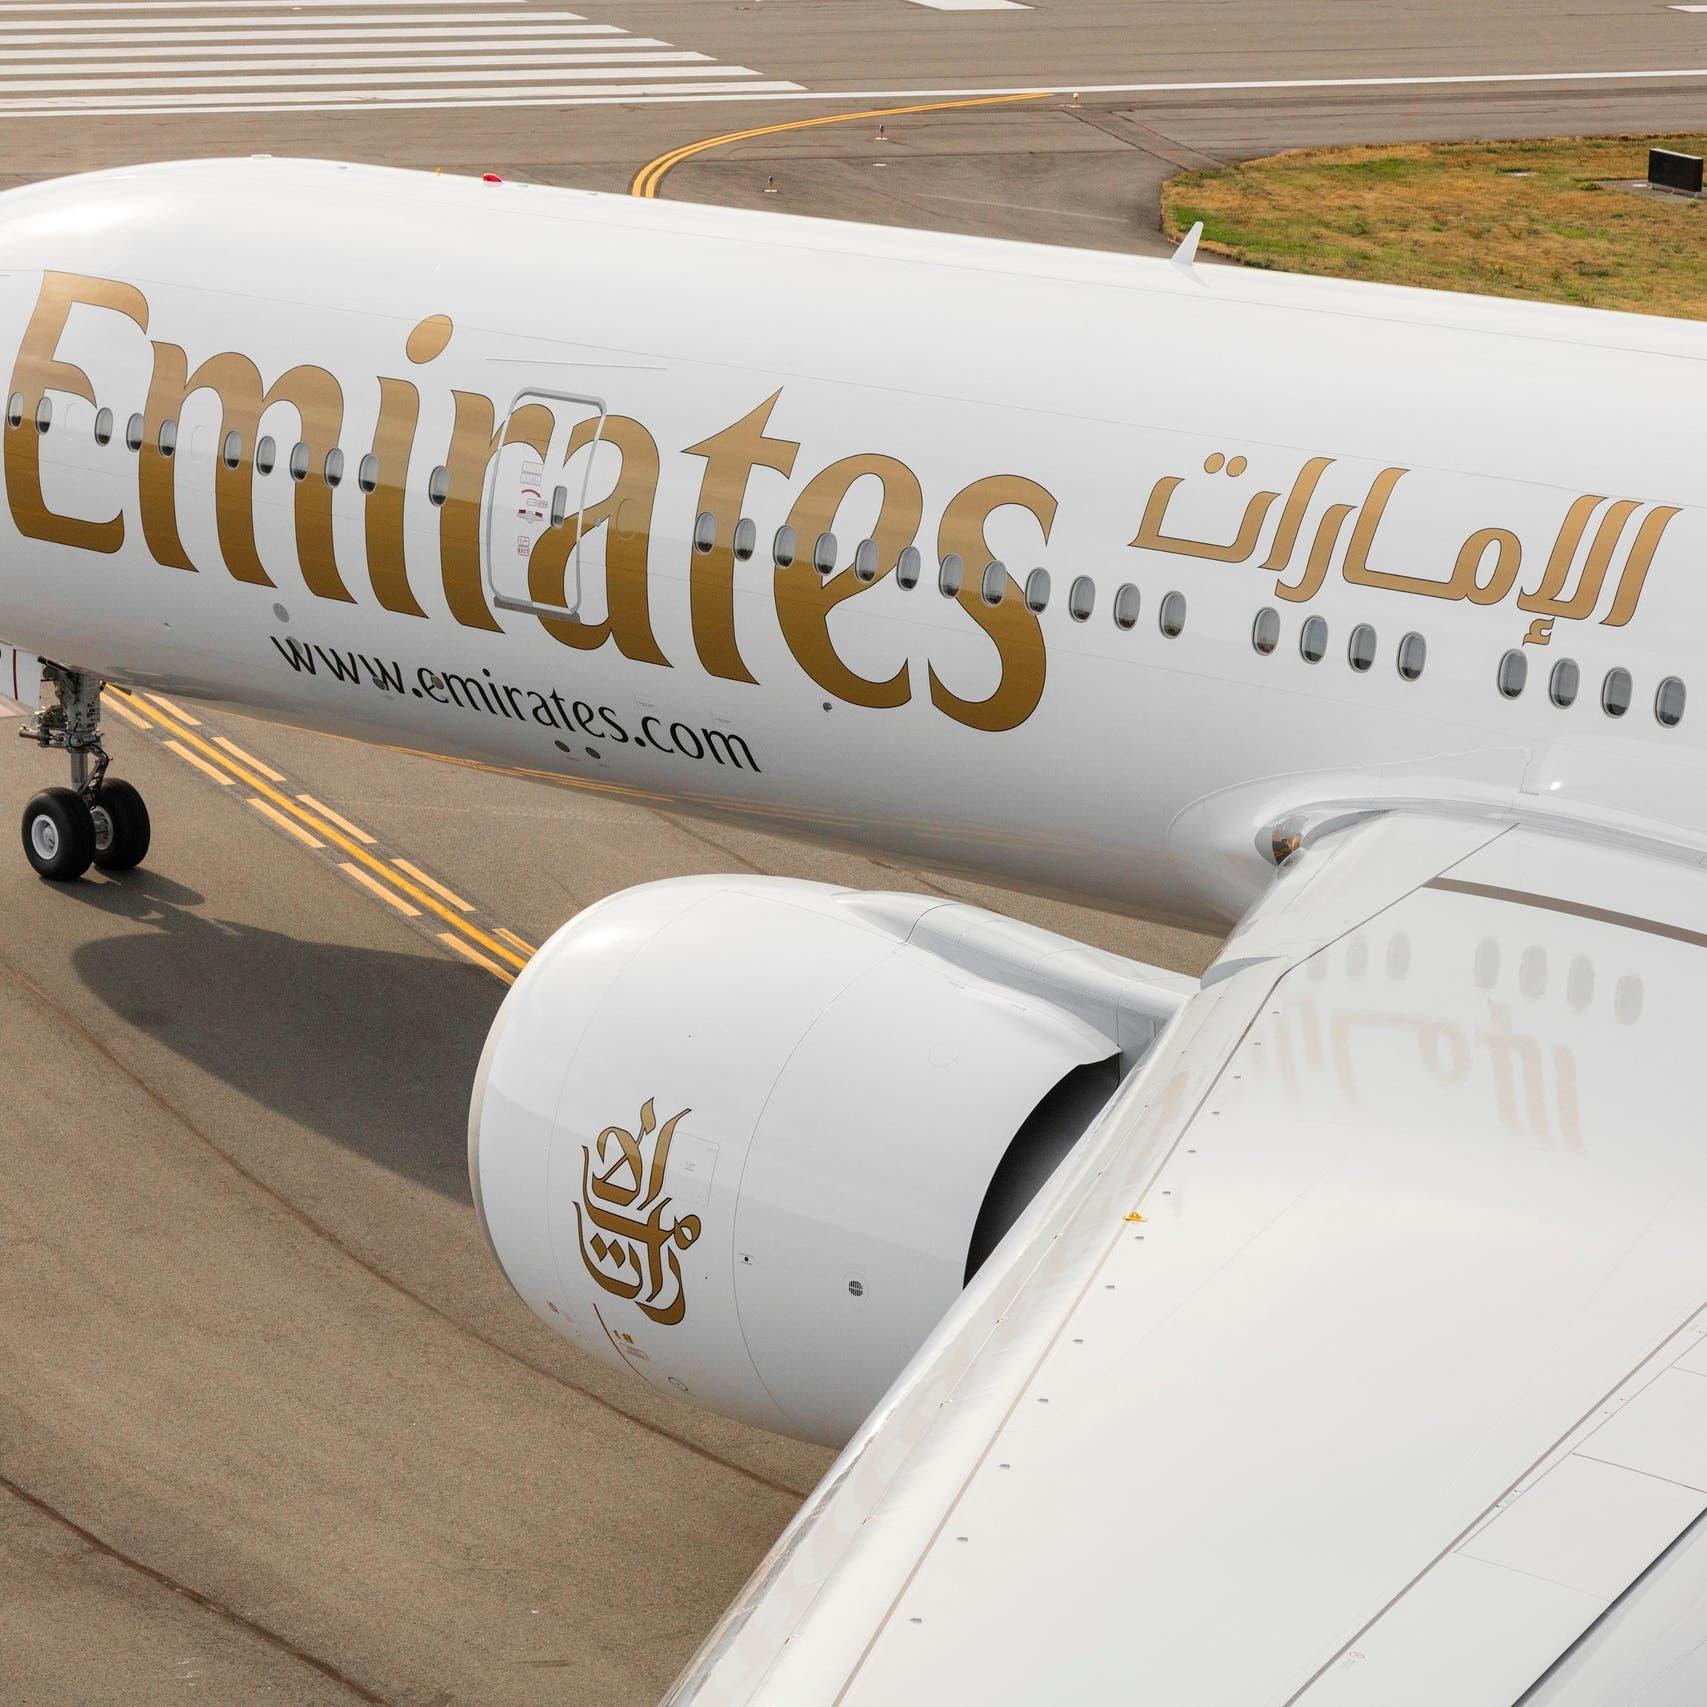 Dubai's Emirates to resume flights to Saudi Arabia after COVID-19 ban lifted